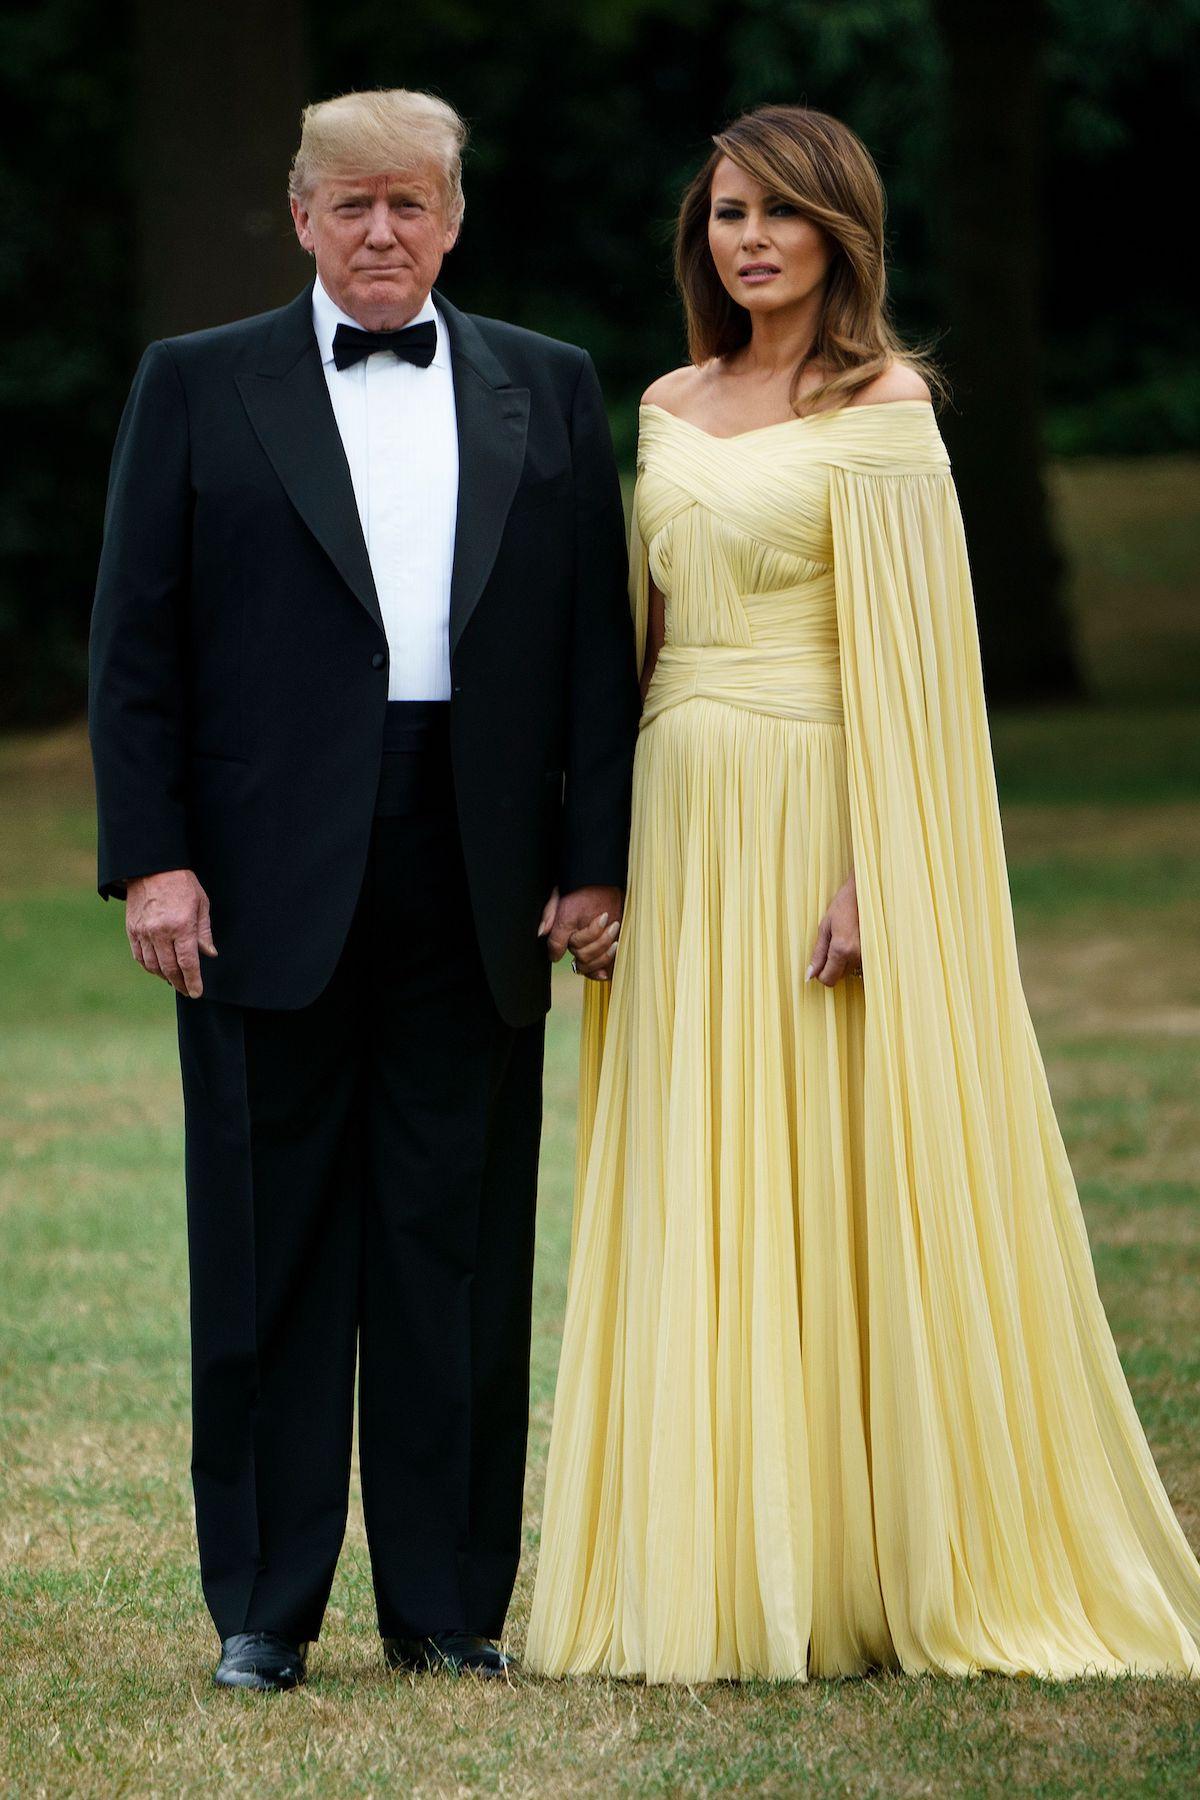 US First Lady Melania Trump (Photo by BRENDAN SMIALOWSKI/AFP via Getty Images)